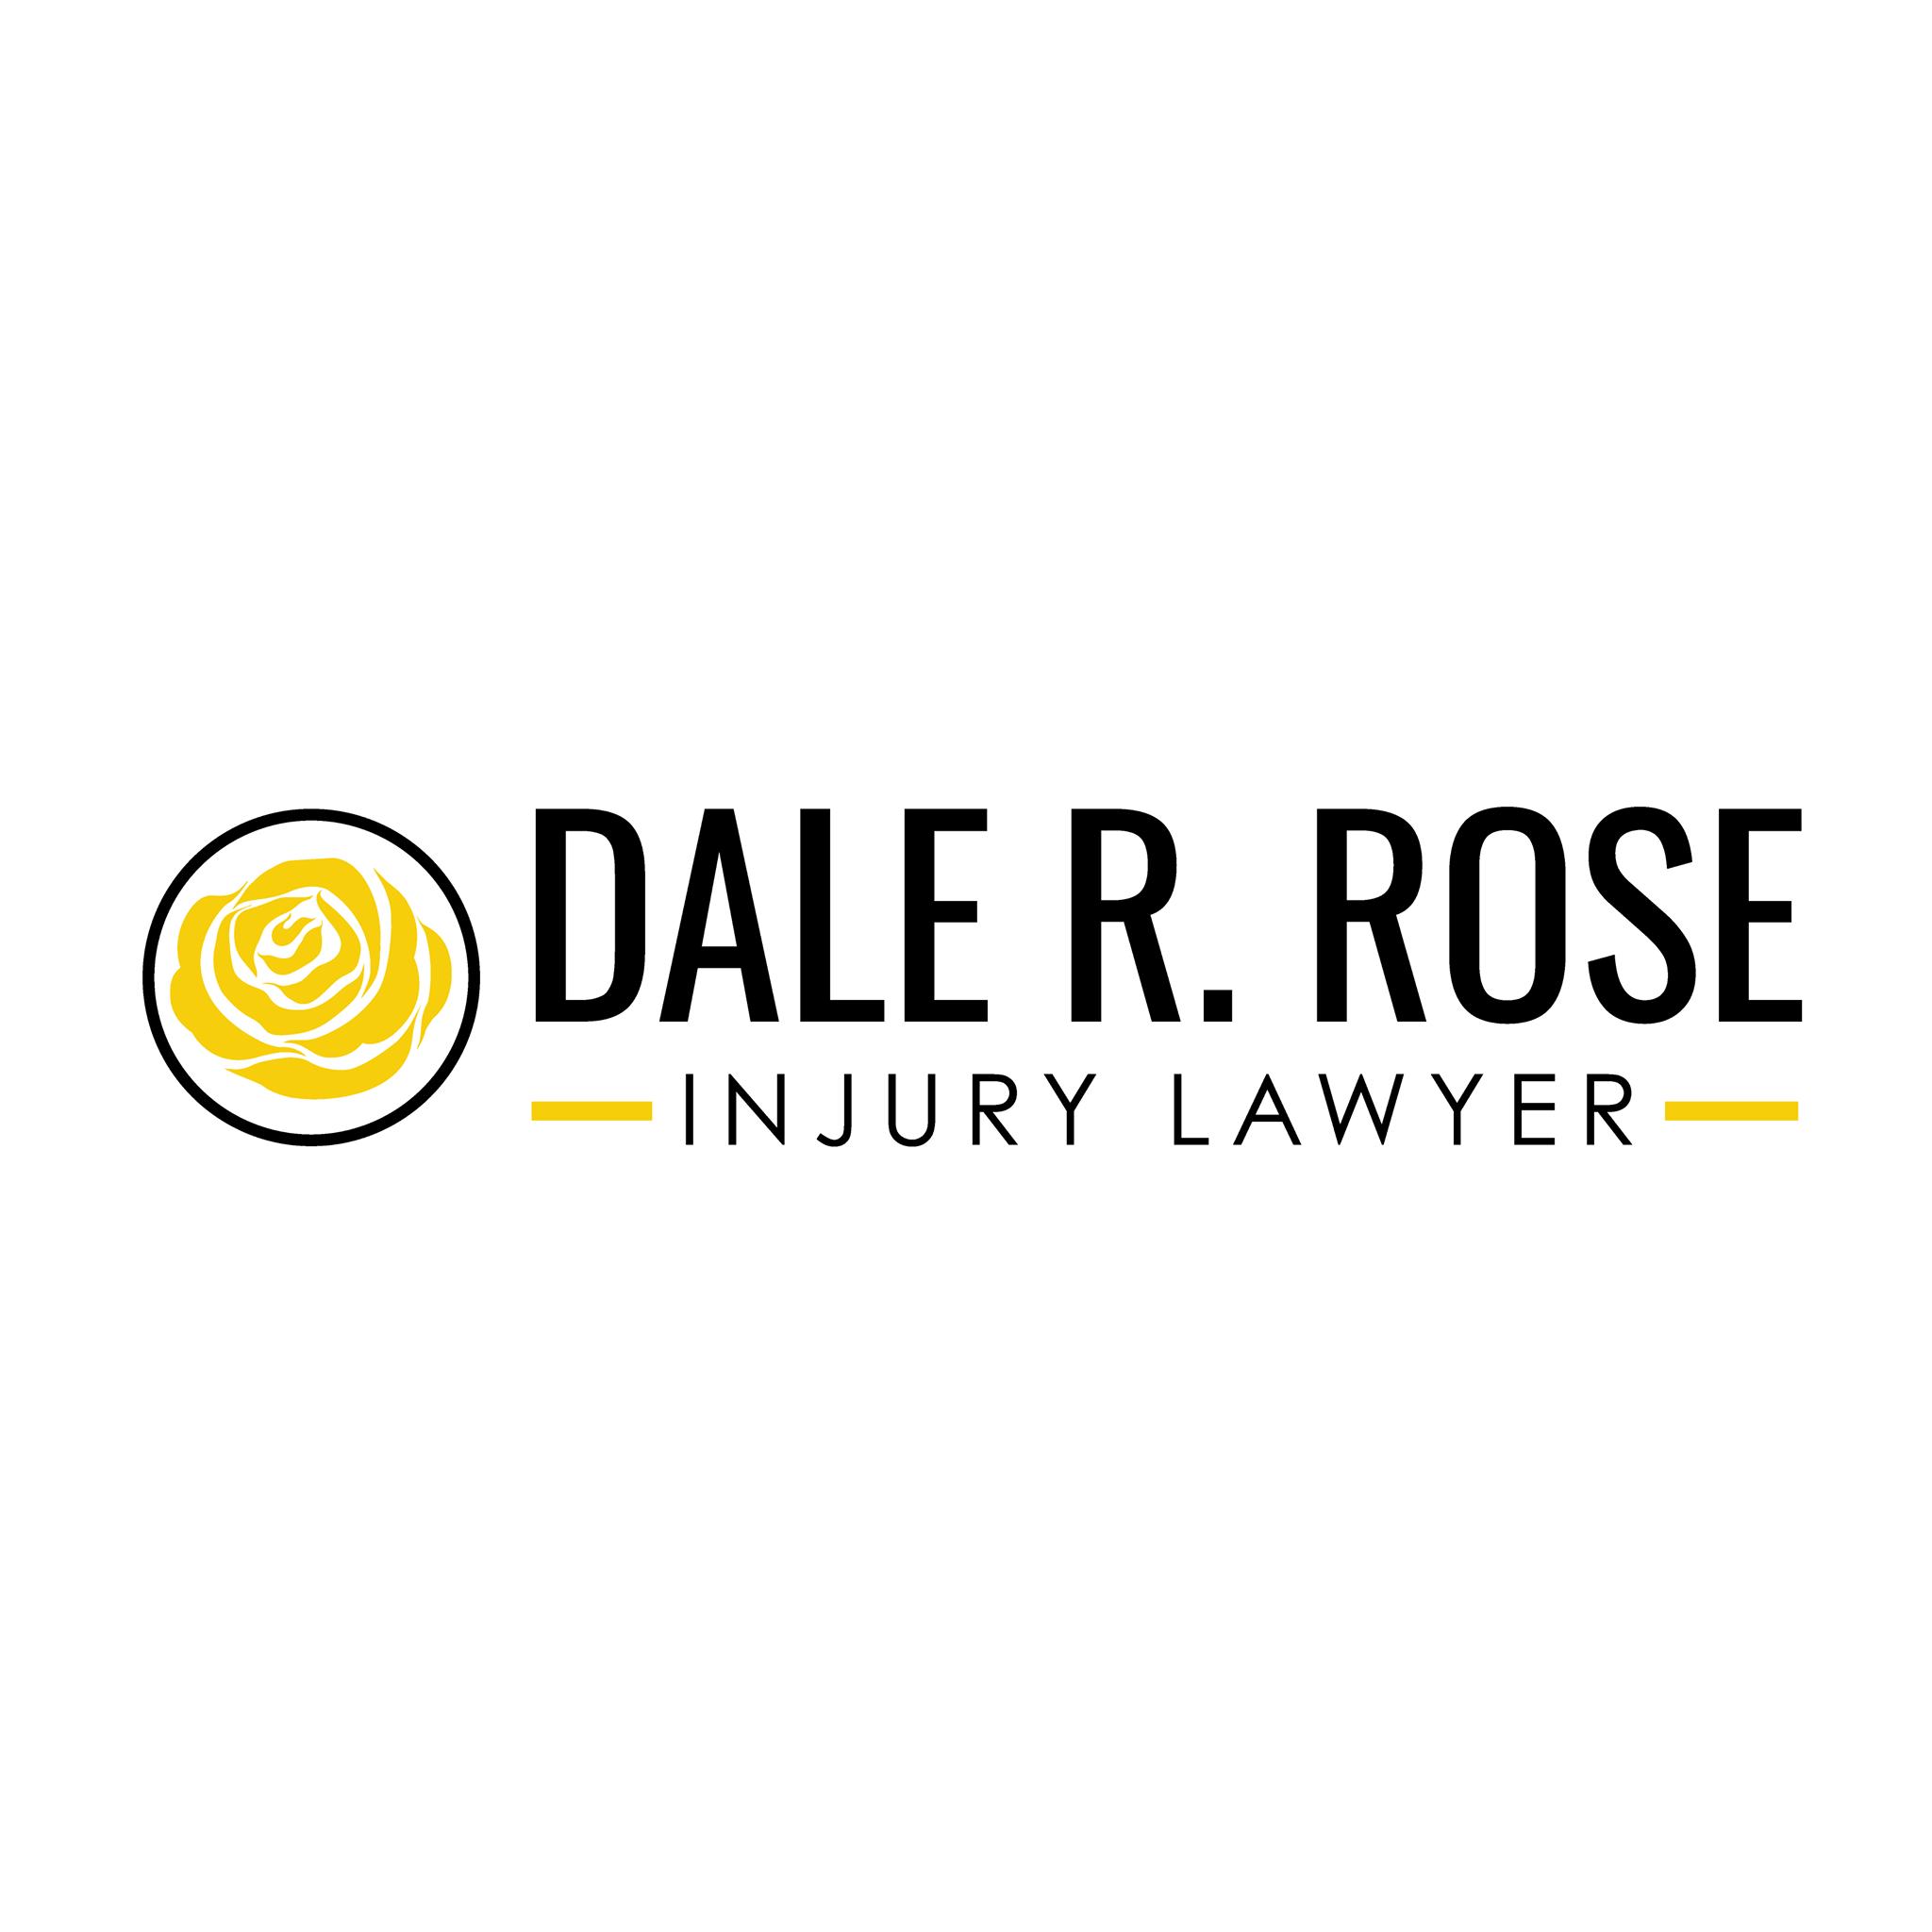 Dale R. Rose, PLCC - McKinney, TX 75071 - (972)367-0055 | ShowMeLocal.com